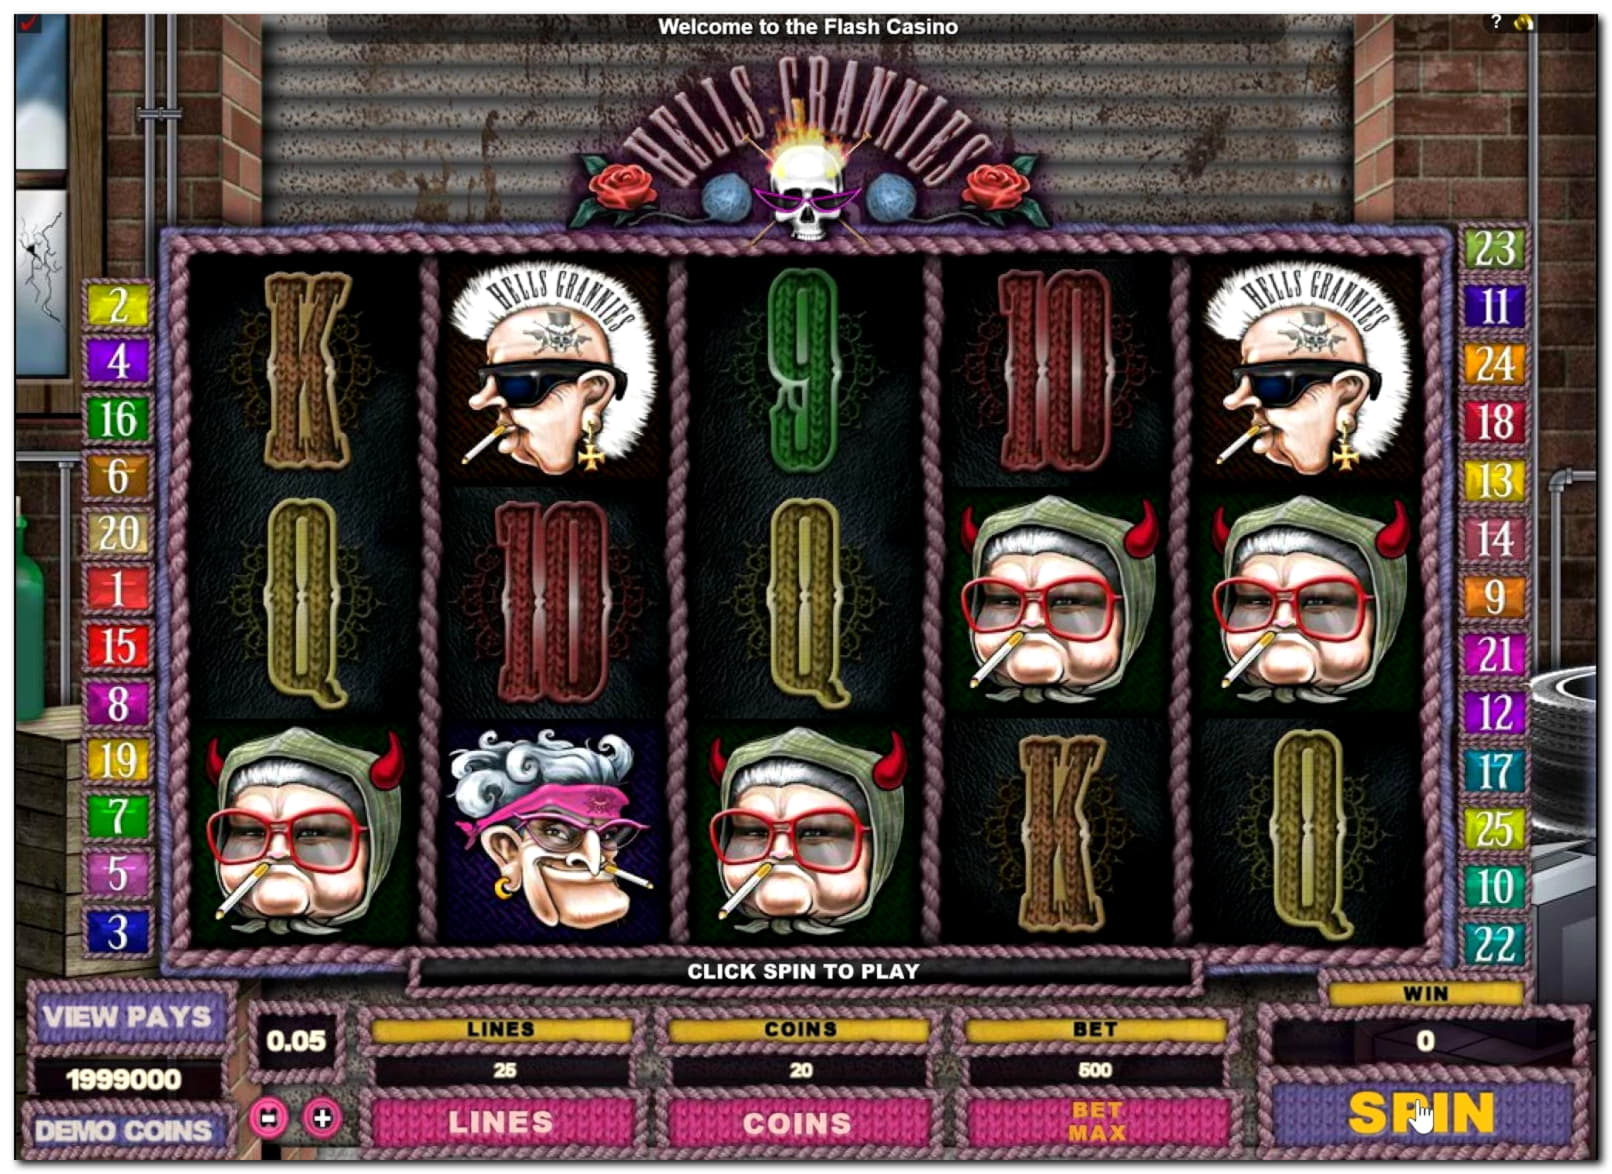 $1580 no deposit bonus casino at Spin Palace Casino